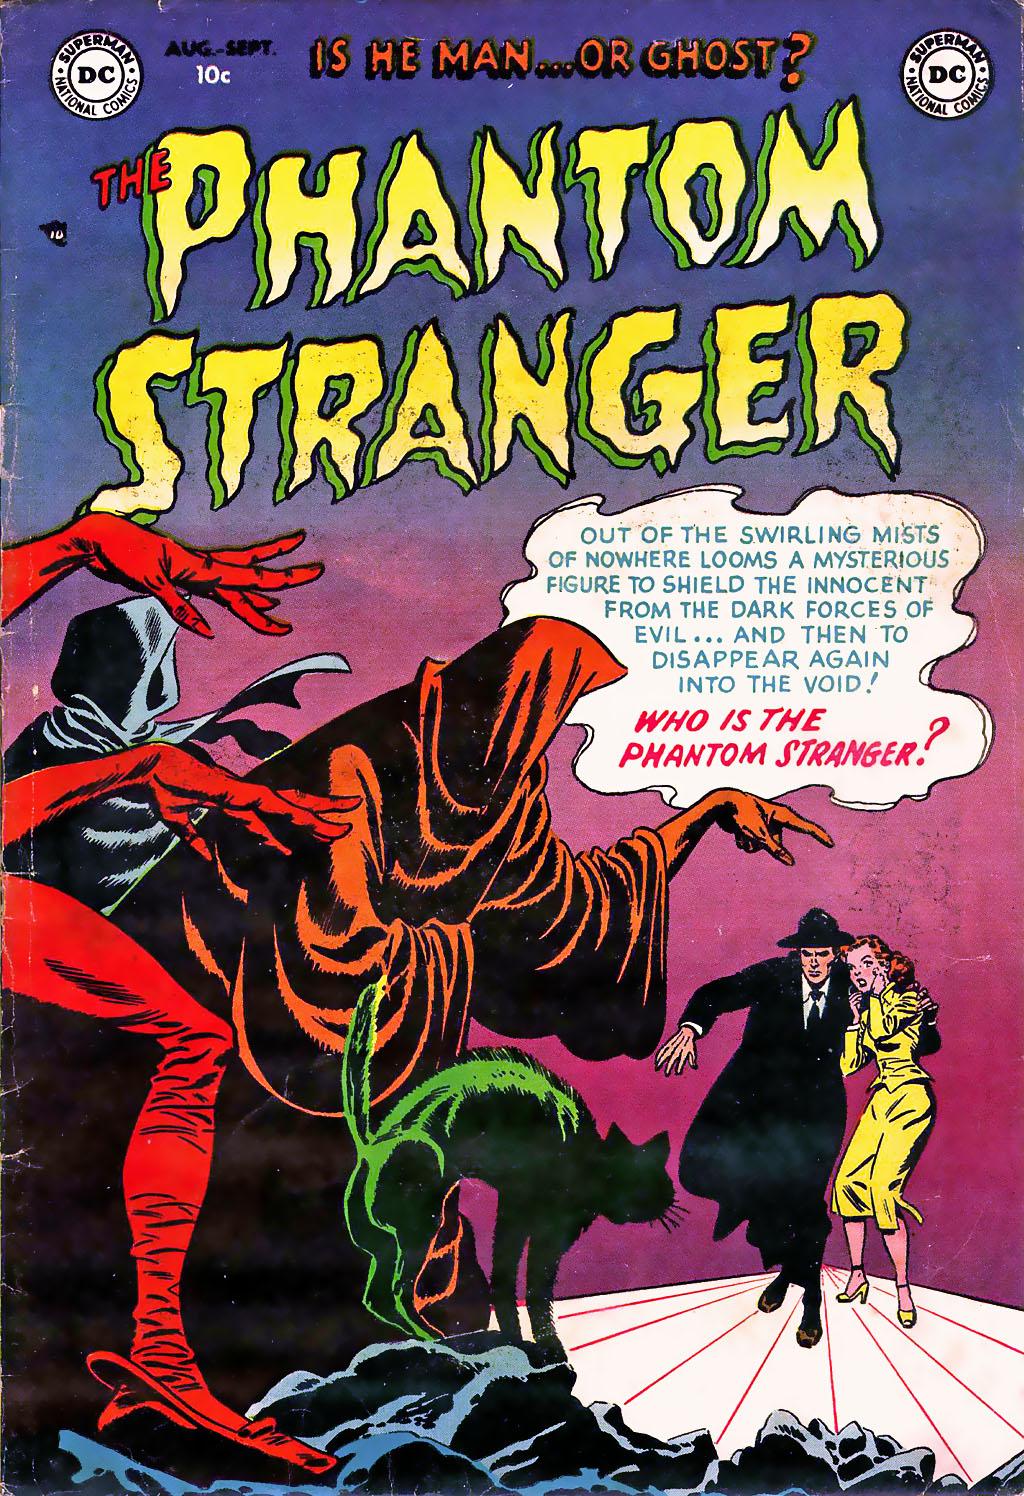 The Phantom Stranger (1952) #1 Carmine Infantino Sy Barry